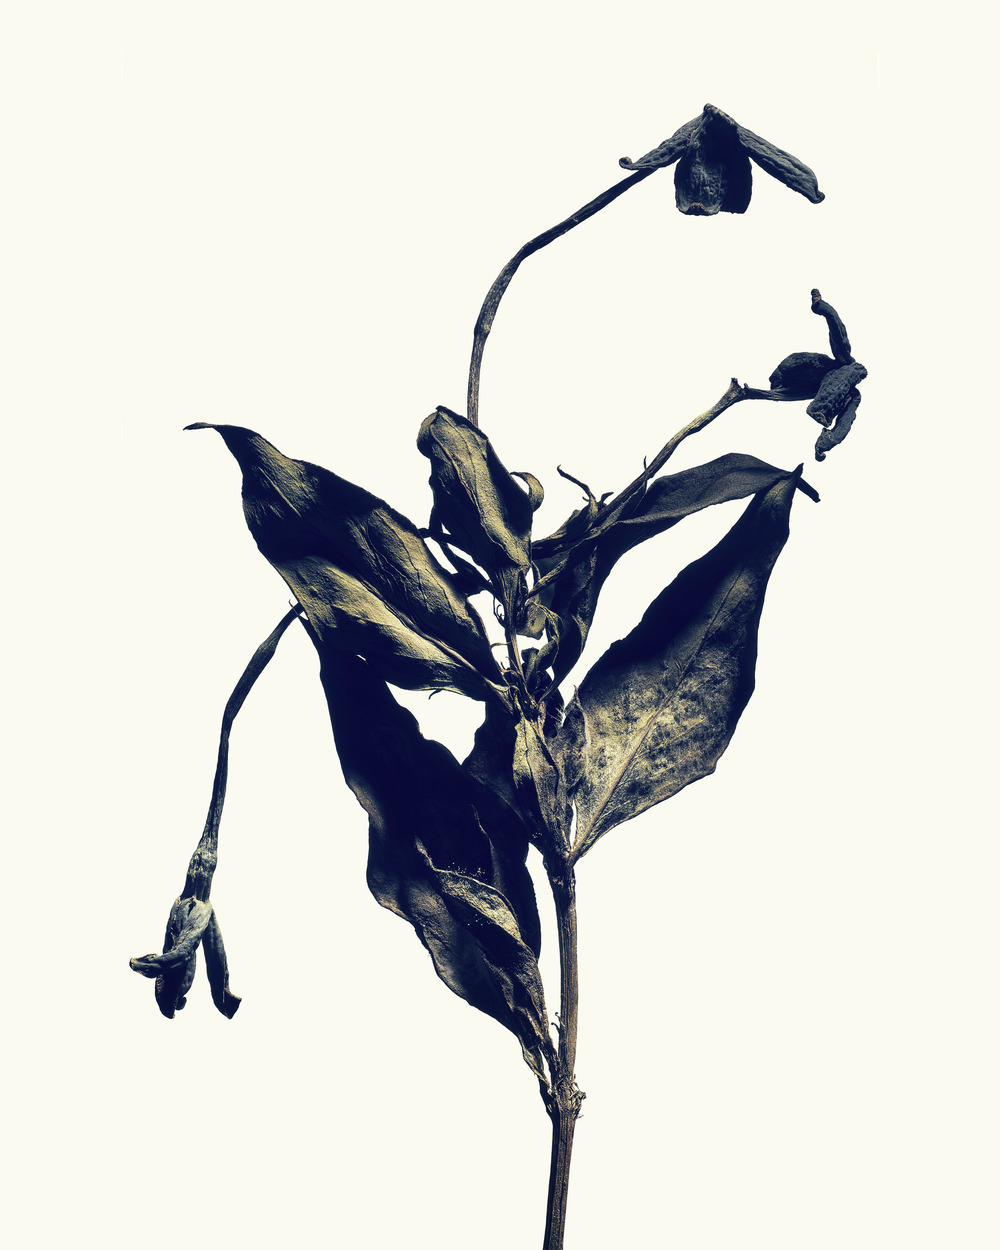 Plate 05: Bouvardia  Edition: Signed &limited to 10  Size: 1118mm x 1397mm  Flower: Bouvardia_leiantha